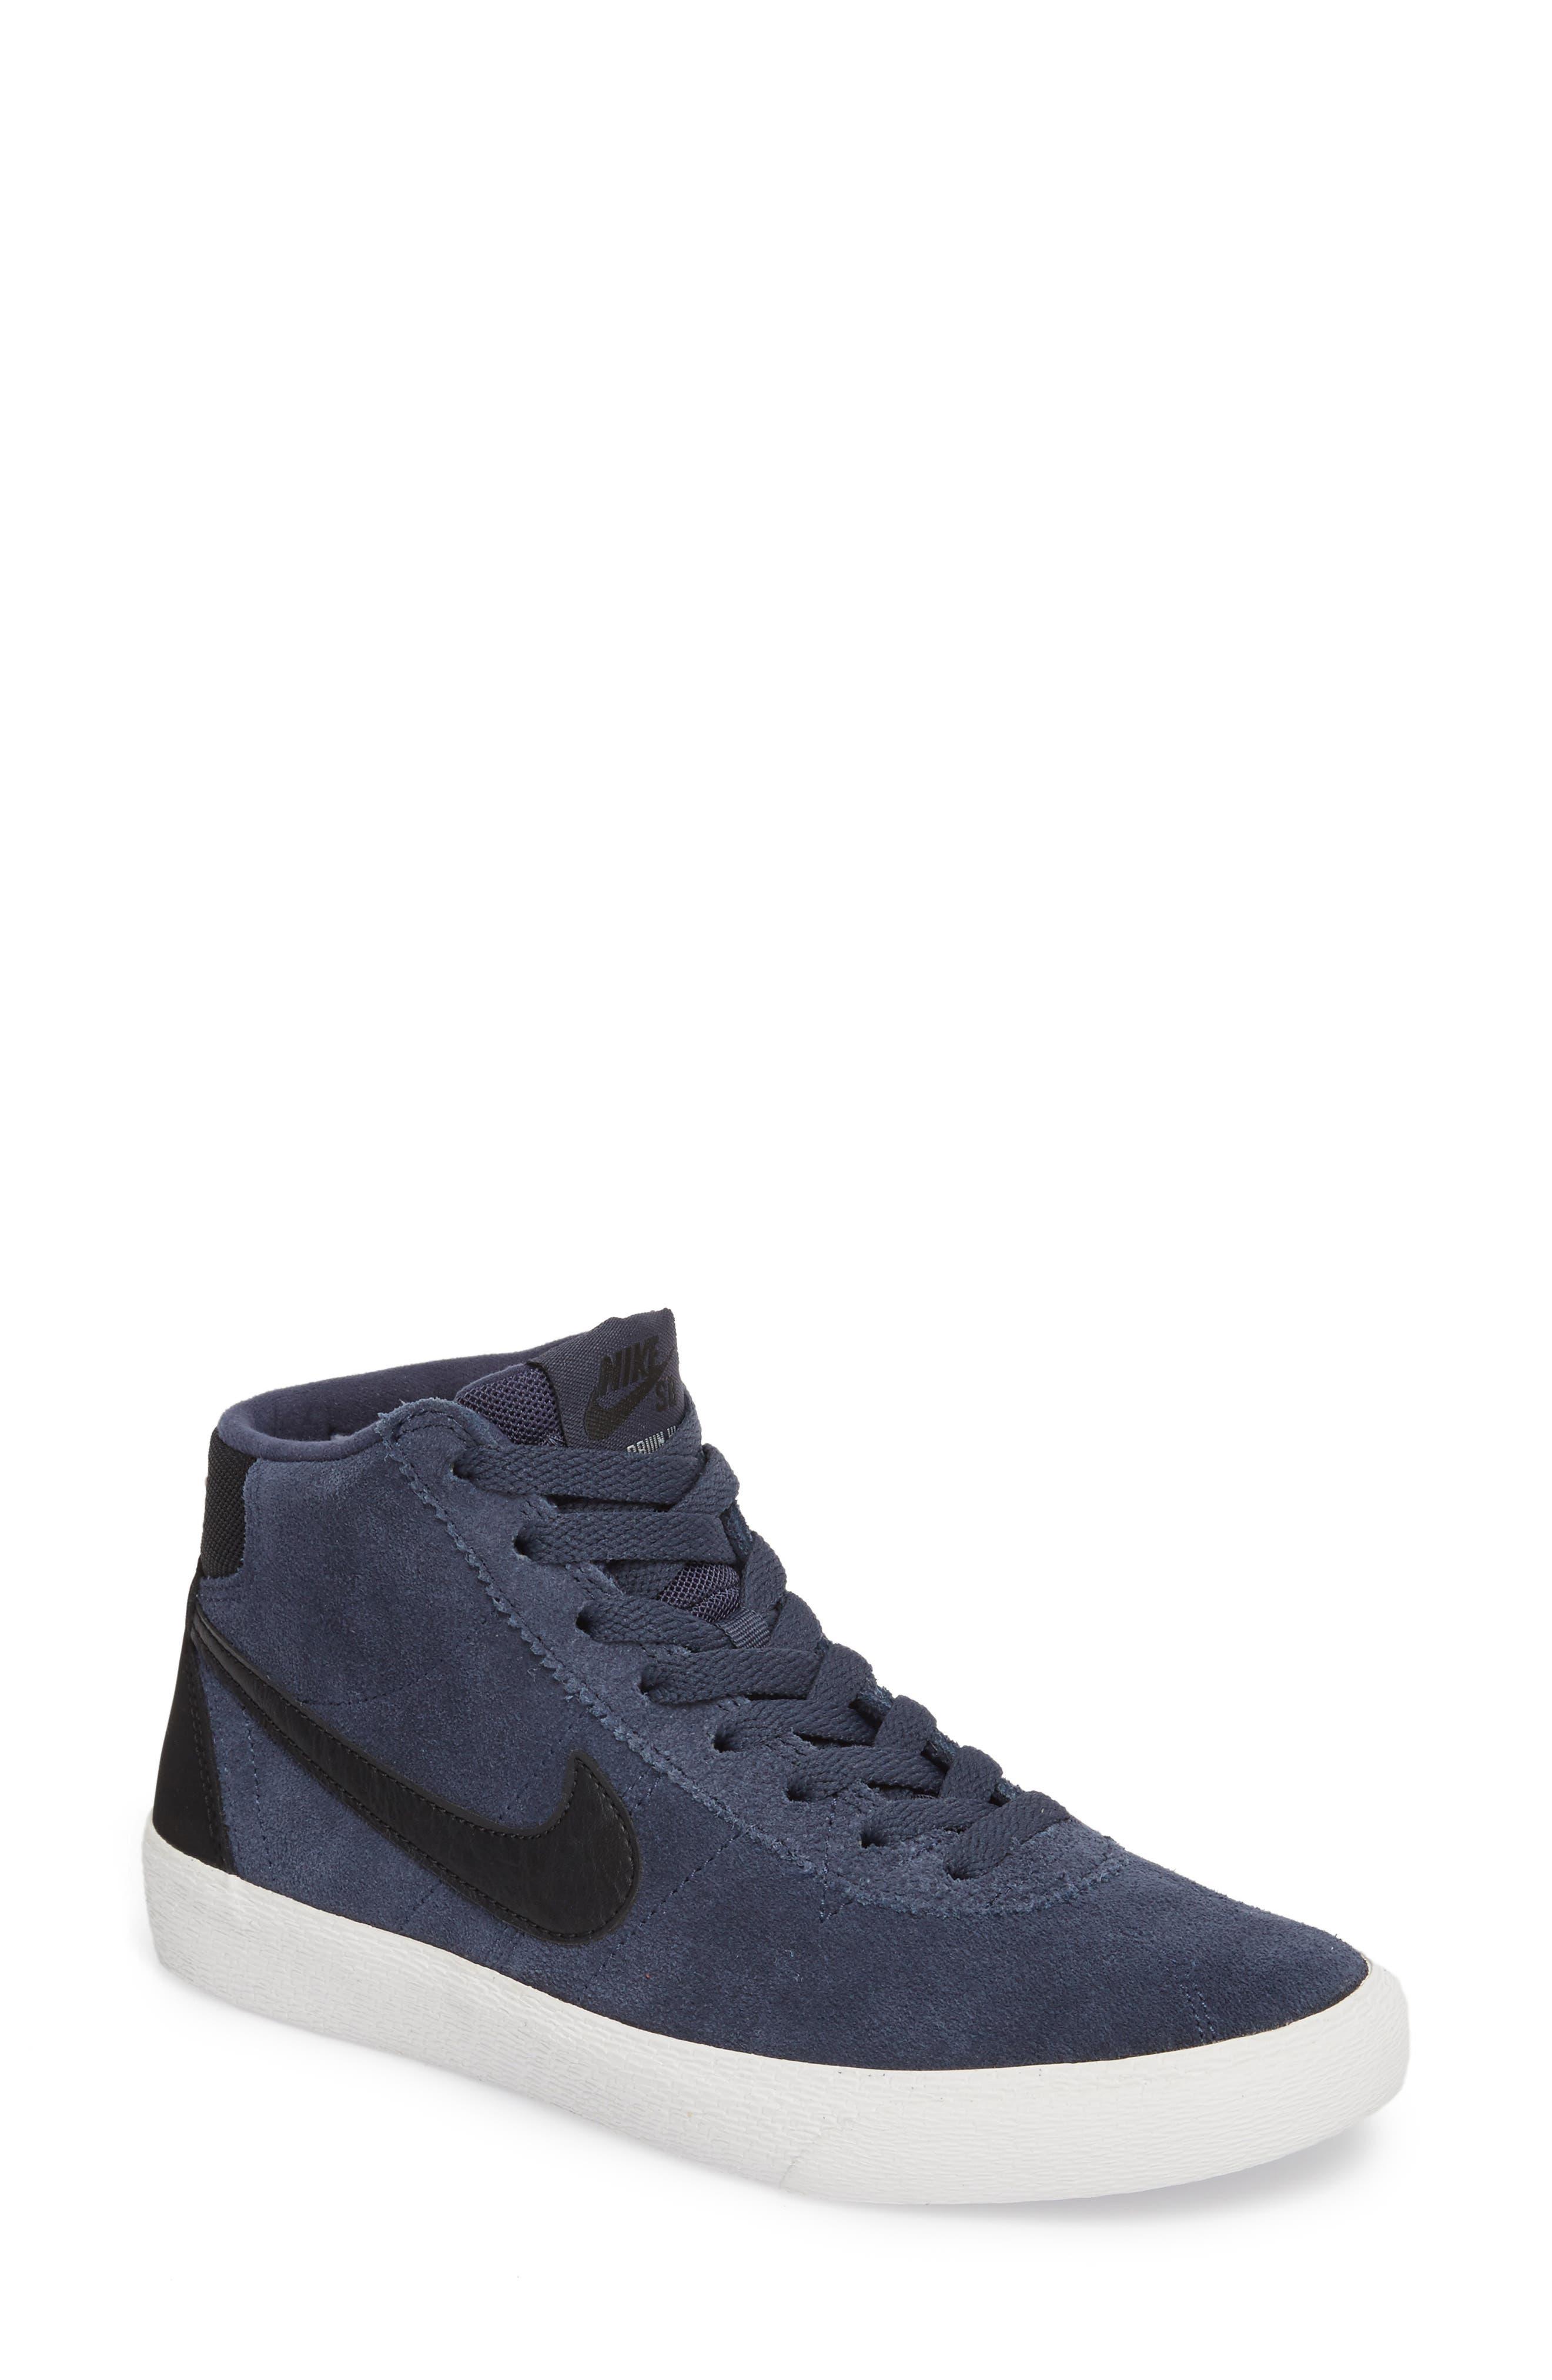 Nike SB Bruin Hi Skateboarding Sneaker (Women)